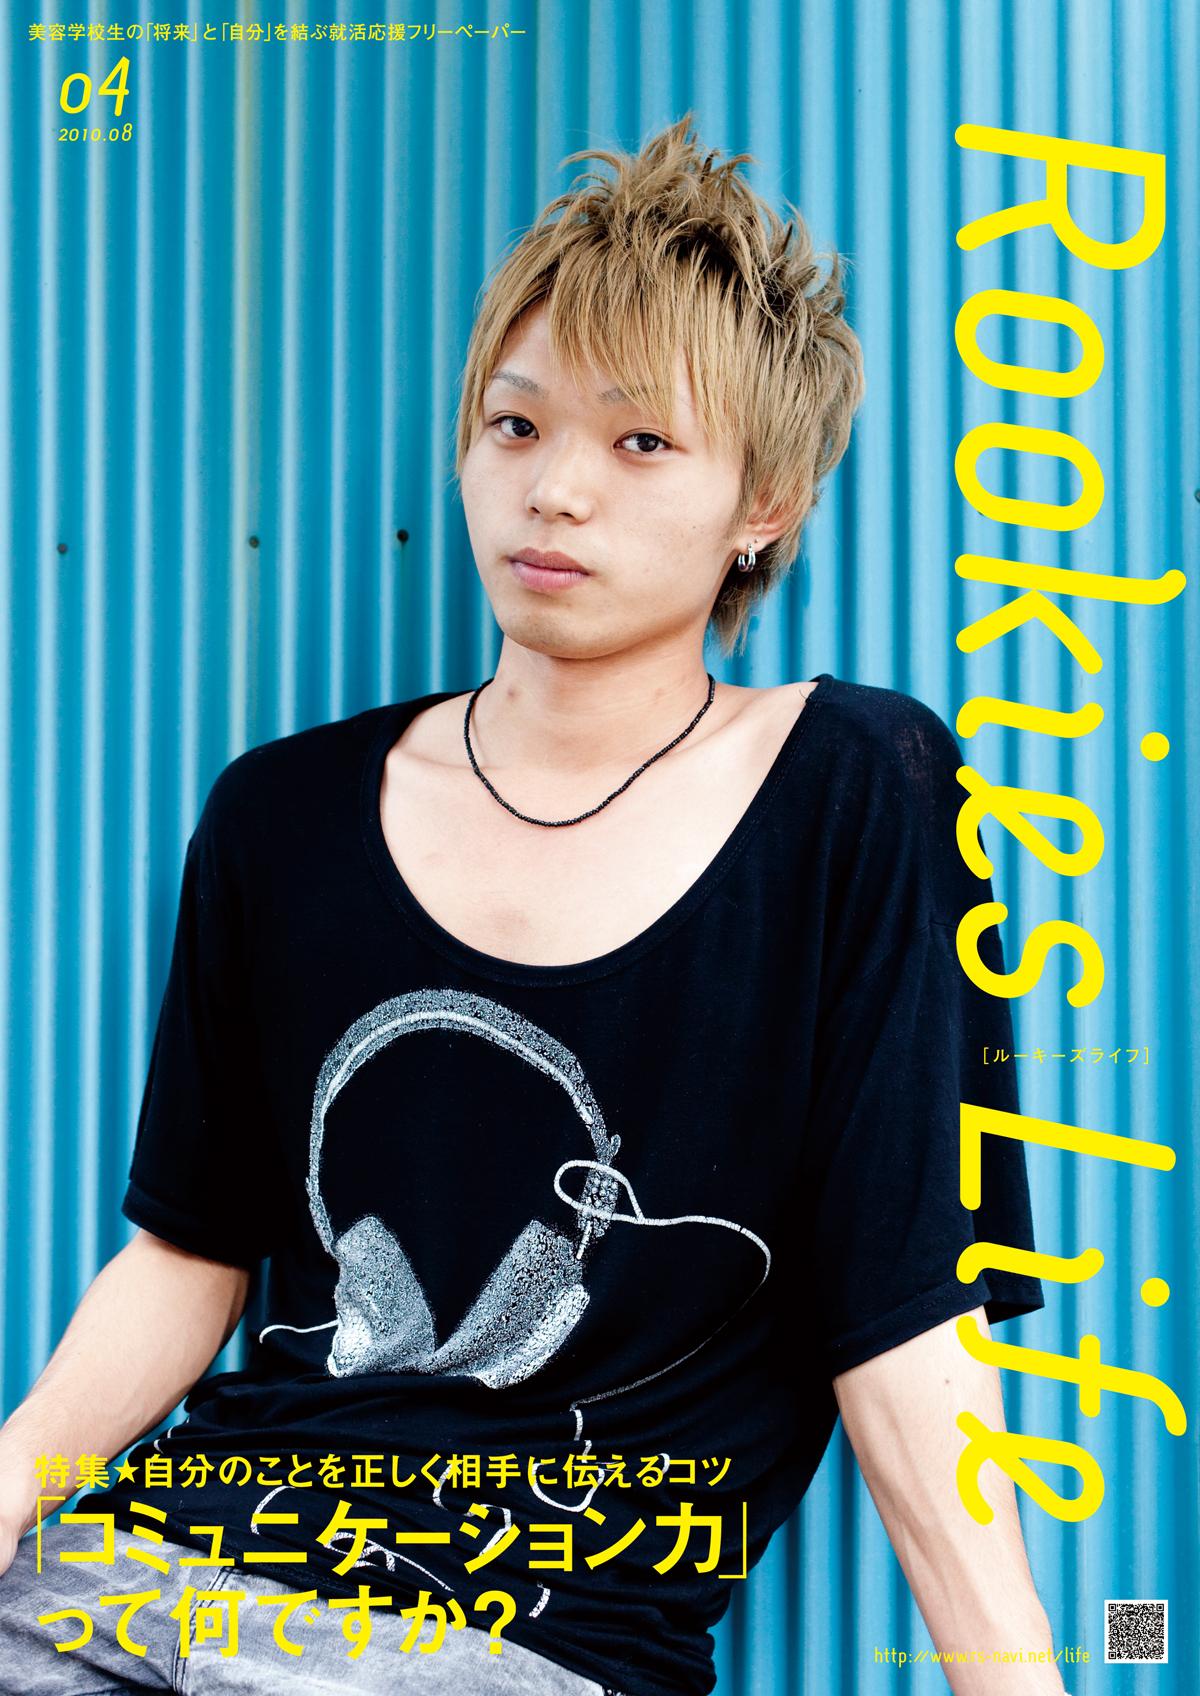 004_life_2010_1200px